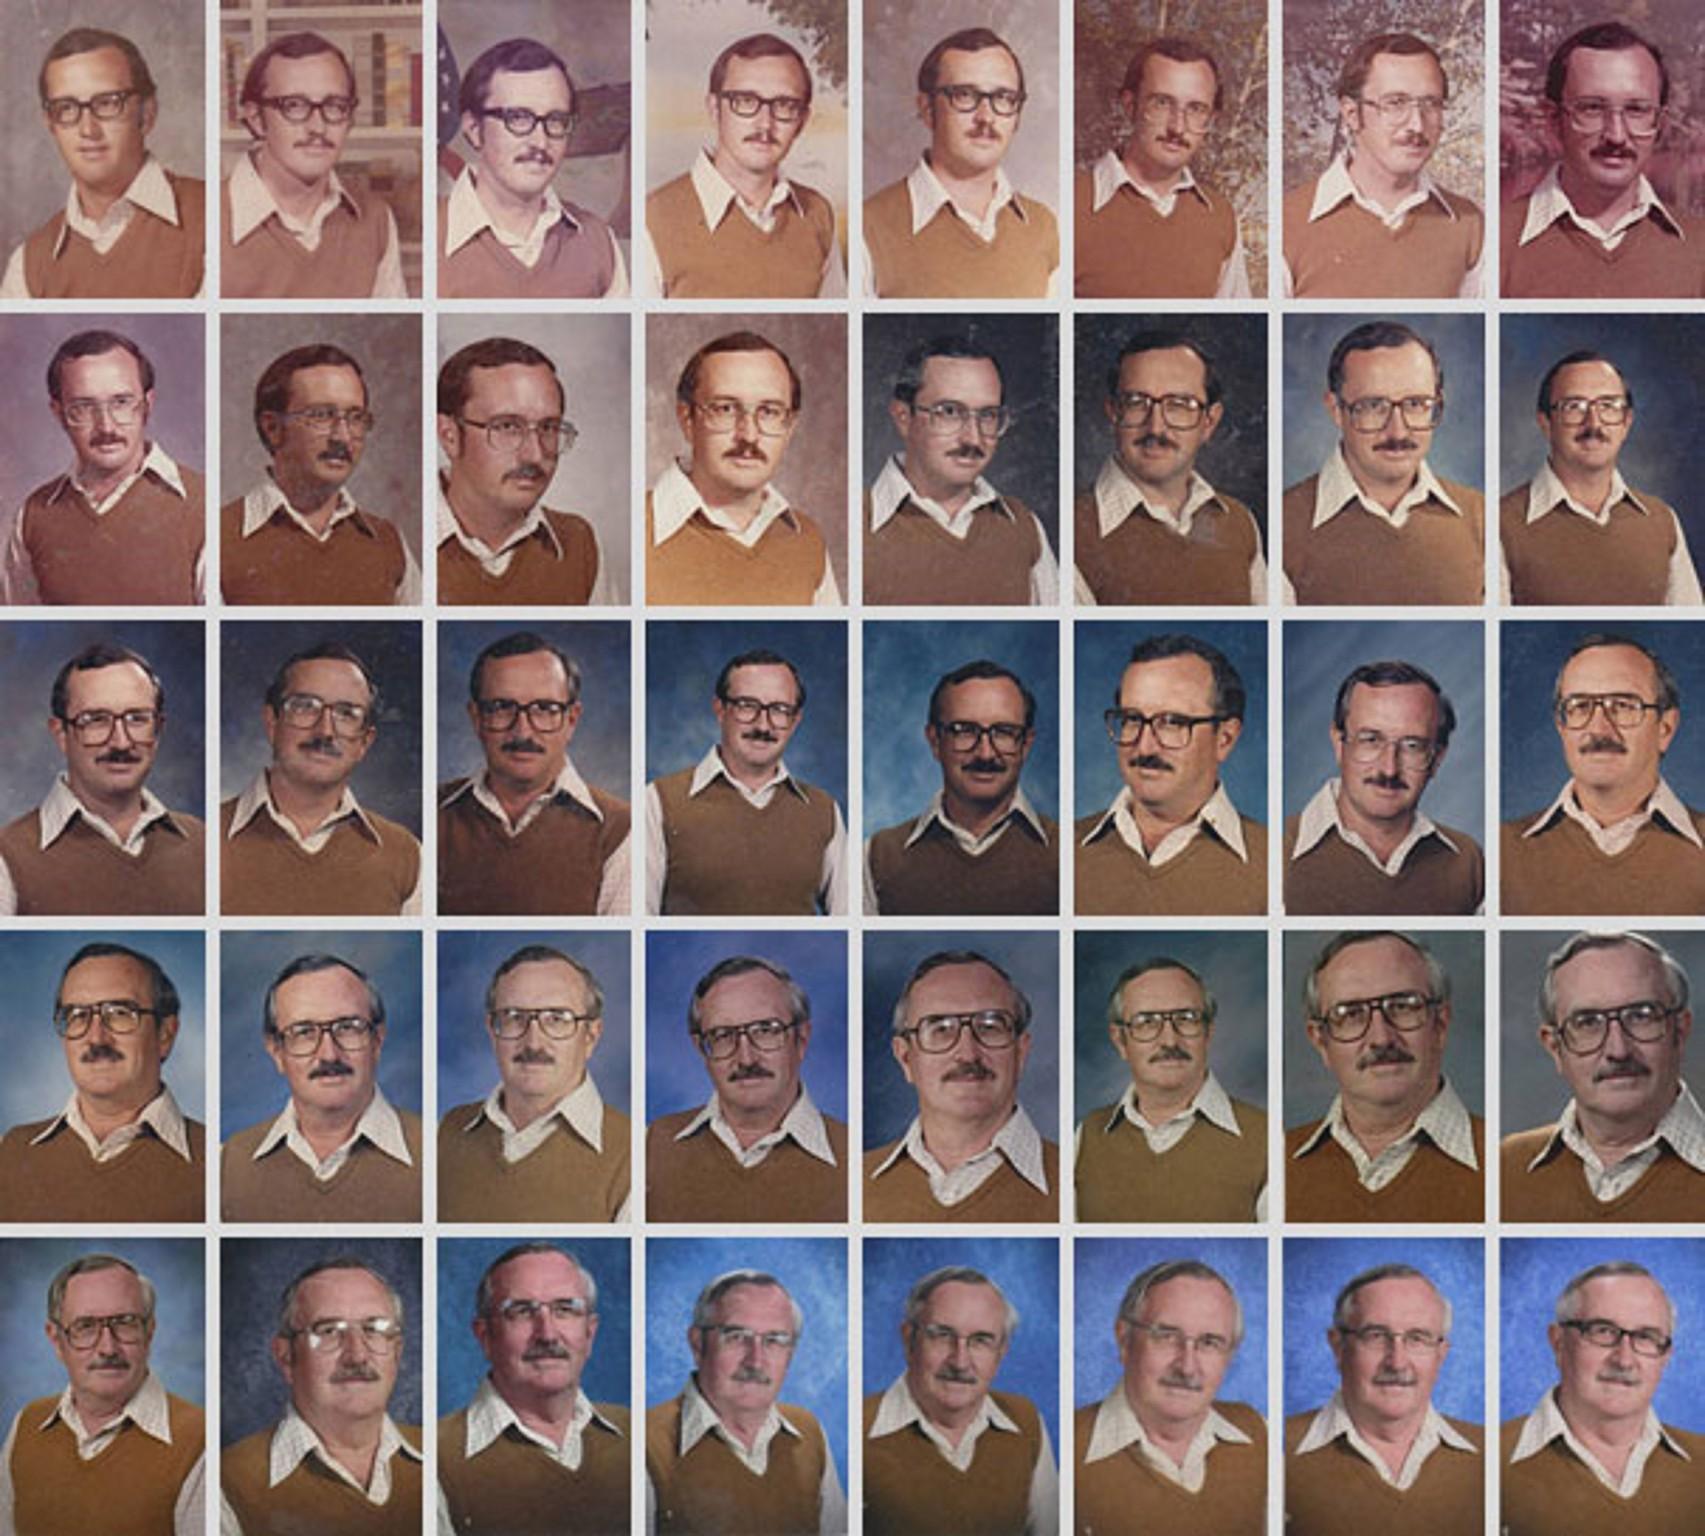 retired-teacher-wears-same-outfit-40-years-212.jpg